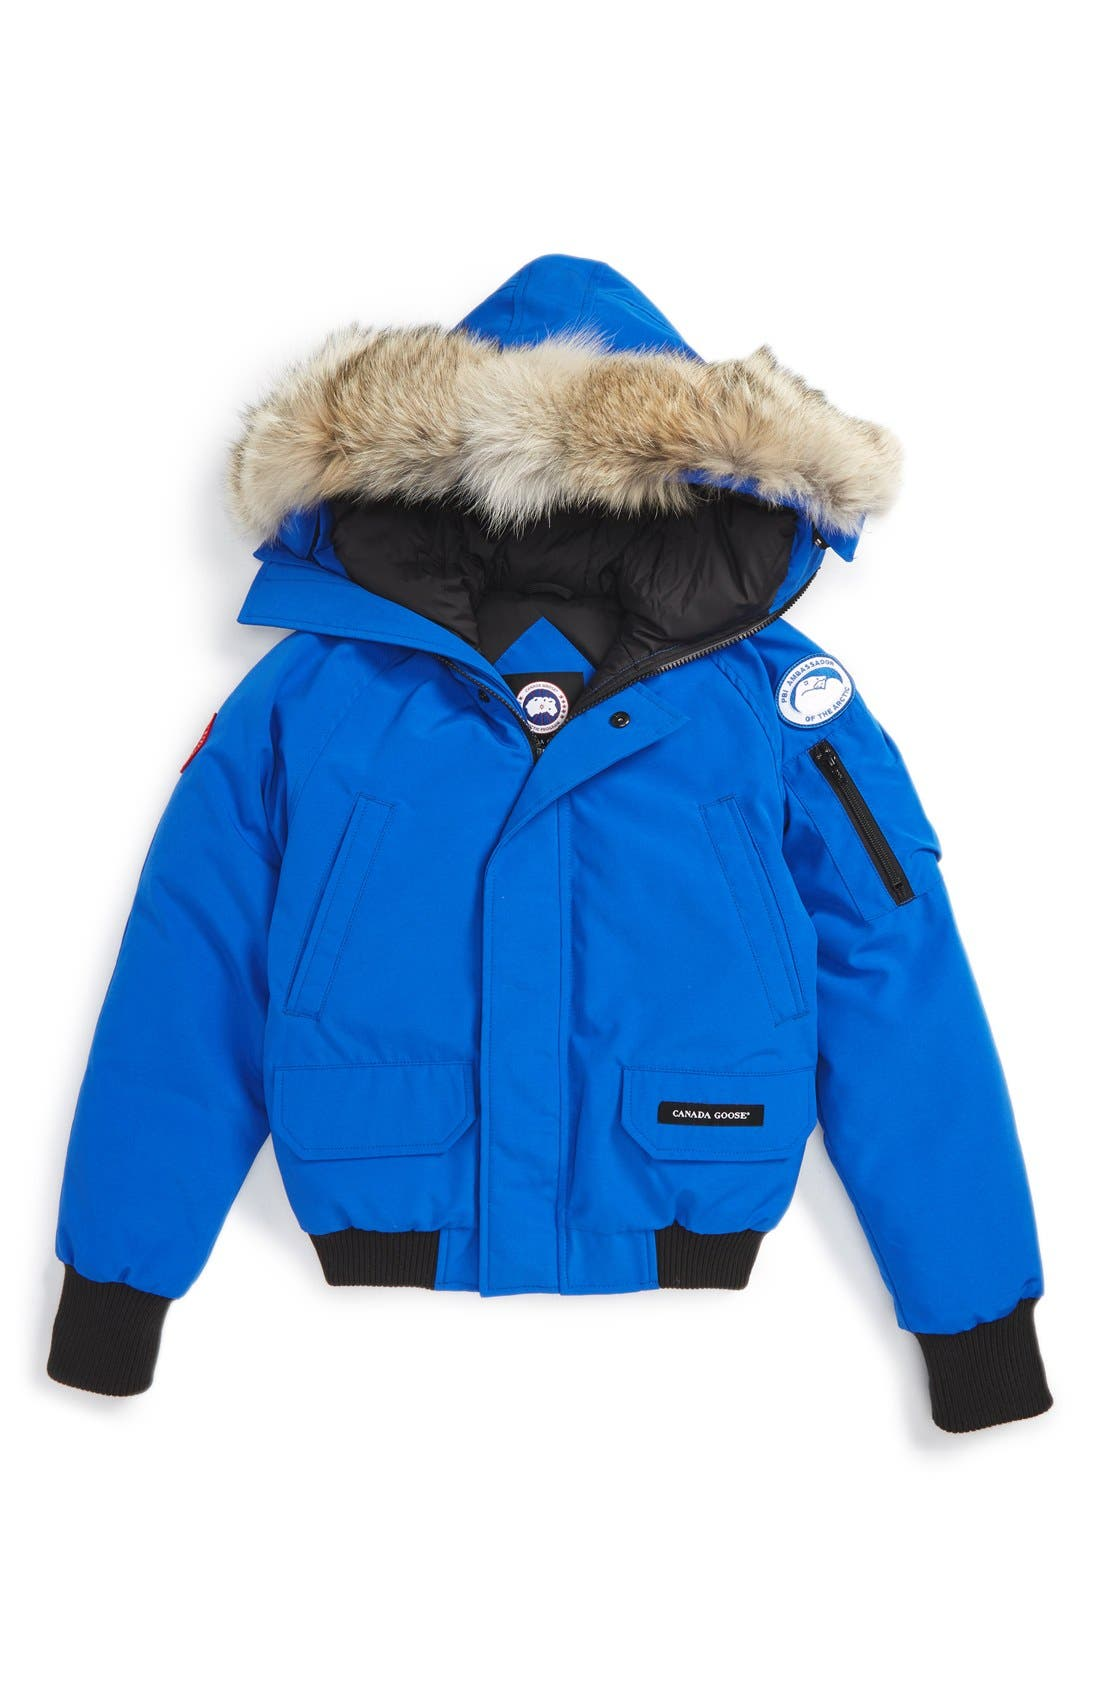 Alternate Image 1 Selected - Canada Goose 'PBI Chilliwack' Hooded Bomber Jacket with Genuine Coyote Fur Trim (Little Boys & Big Boys)